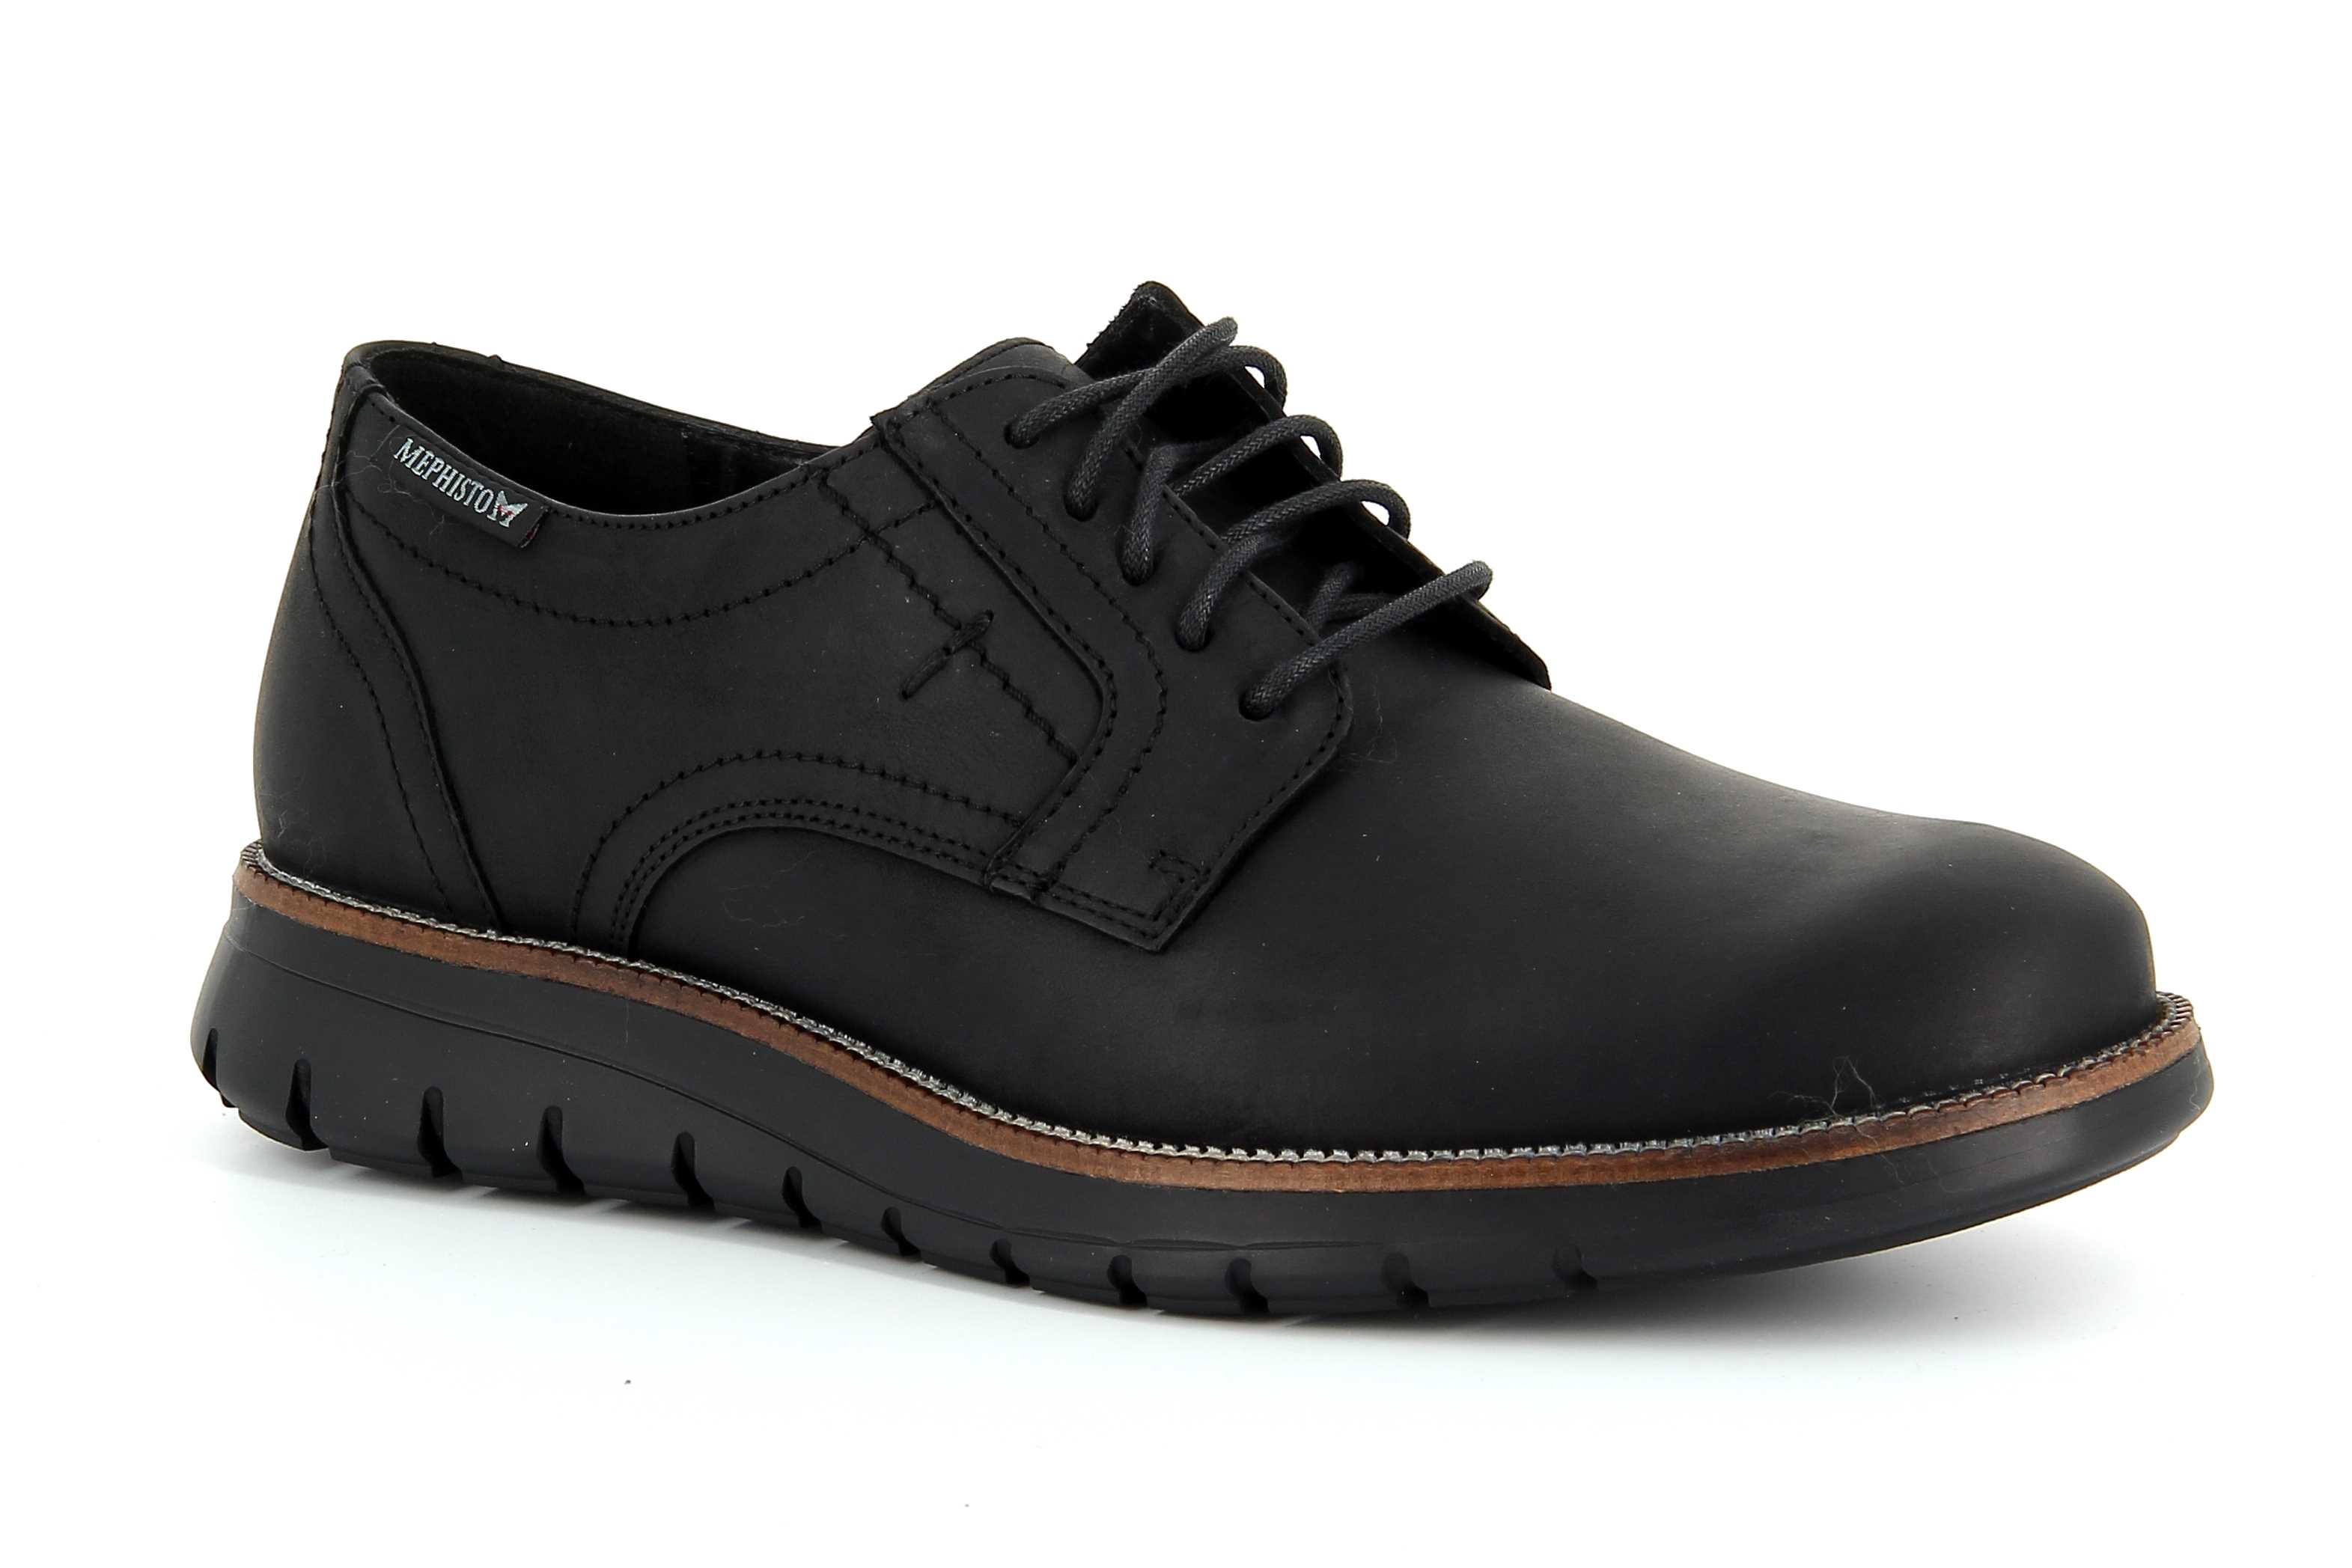 mephisto shop chaussures d 39 exception lacets homme mod le brett. Black Bedroom Furniture Sets. Home Design Ideas